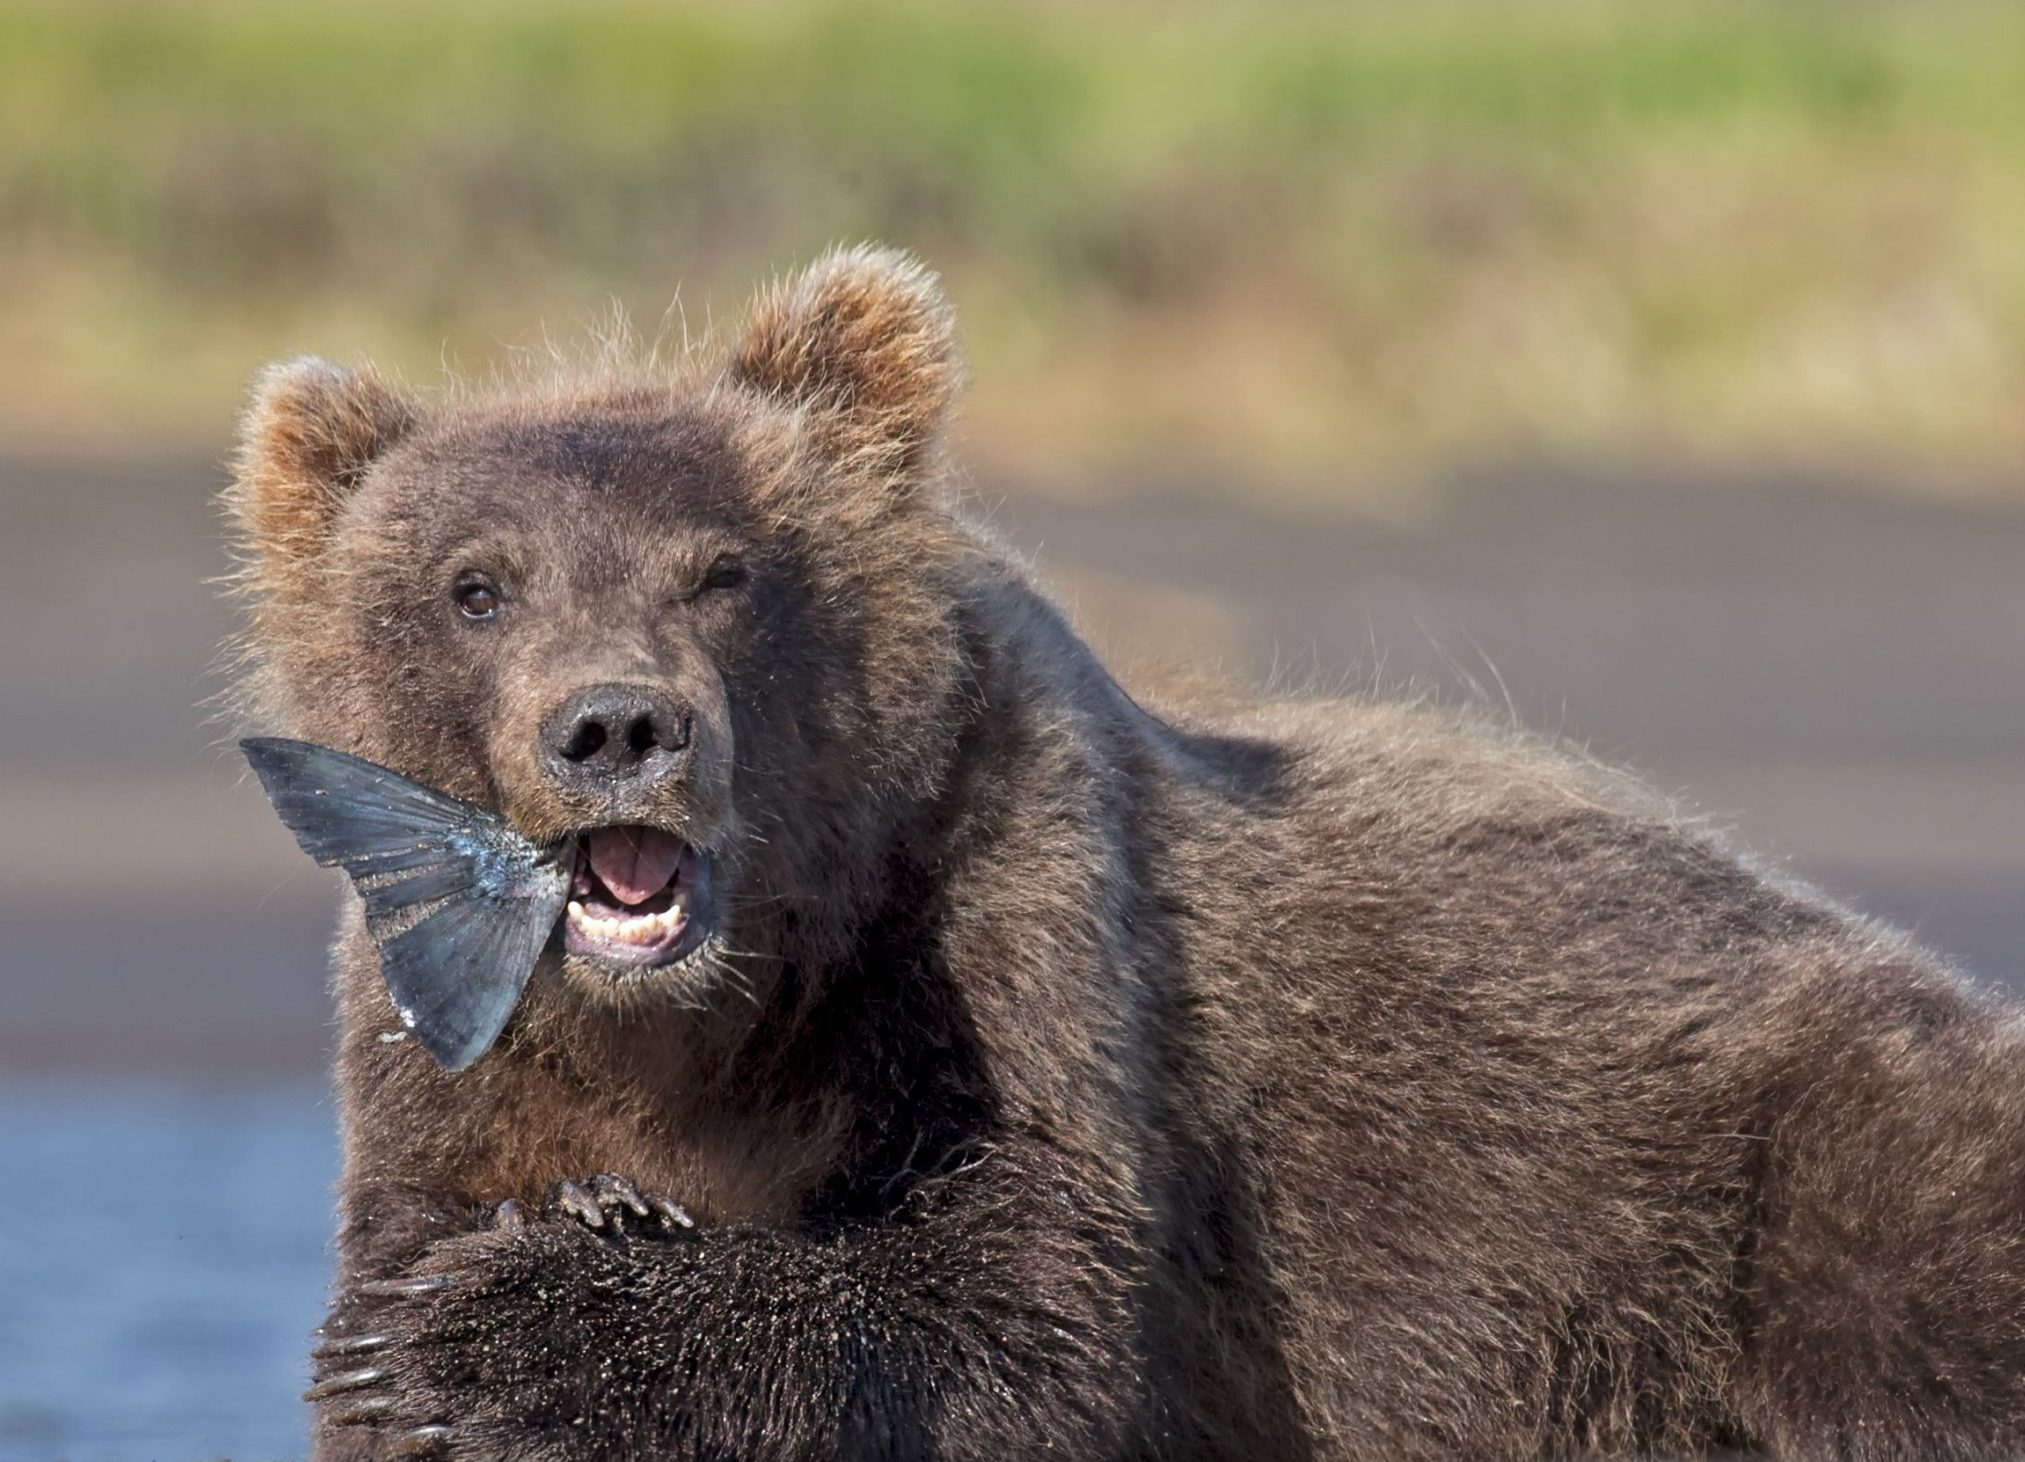 Brown bear cub eating a salmon in Alaska